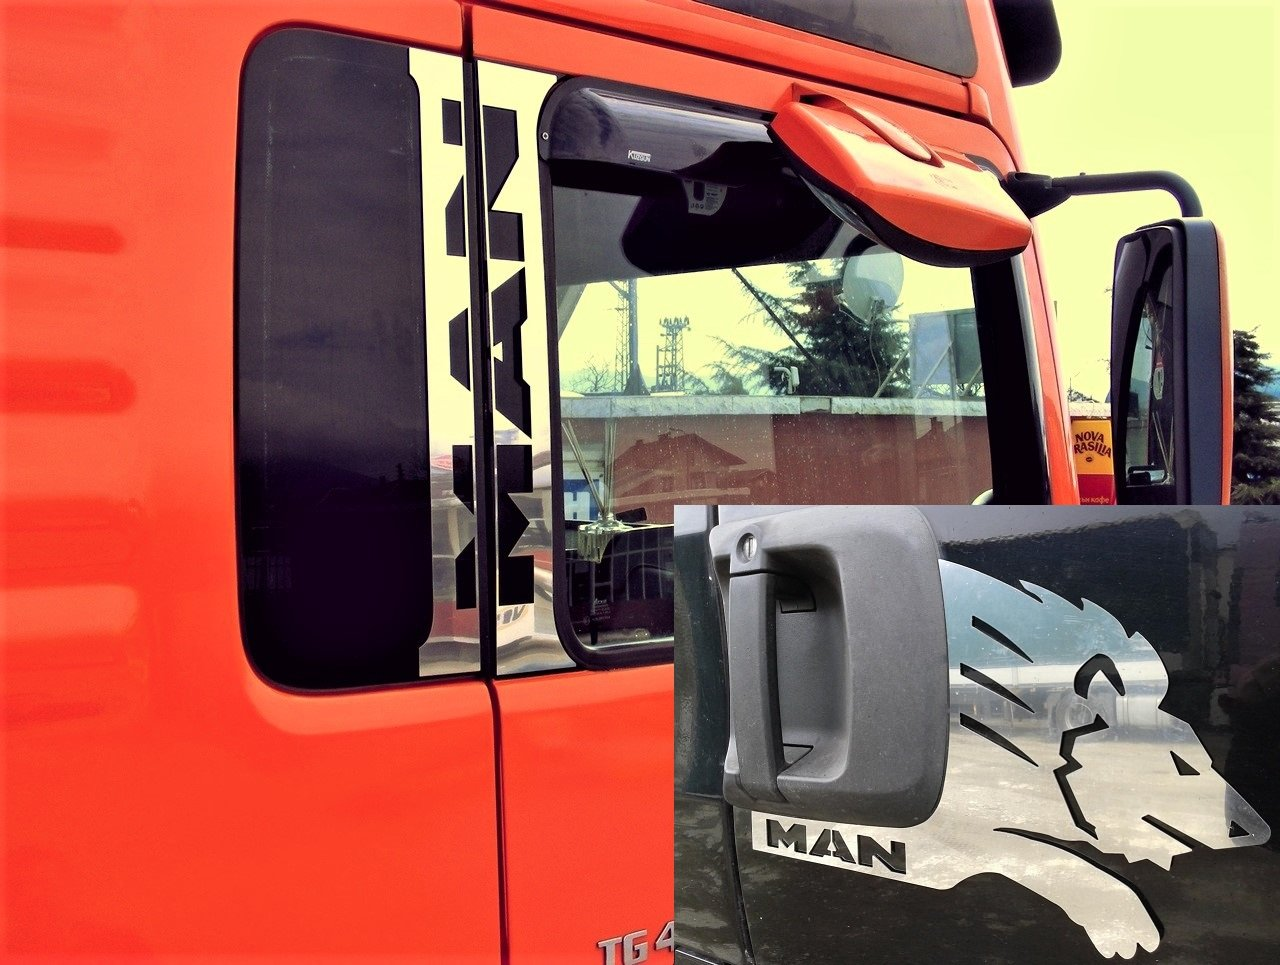 6 pezzi in acciaio INOX lucido finestra + Door panel Decorations Lion per Man Tga Tgl TGS TGX Trucks ES022006